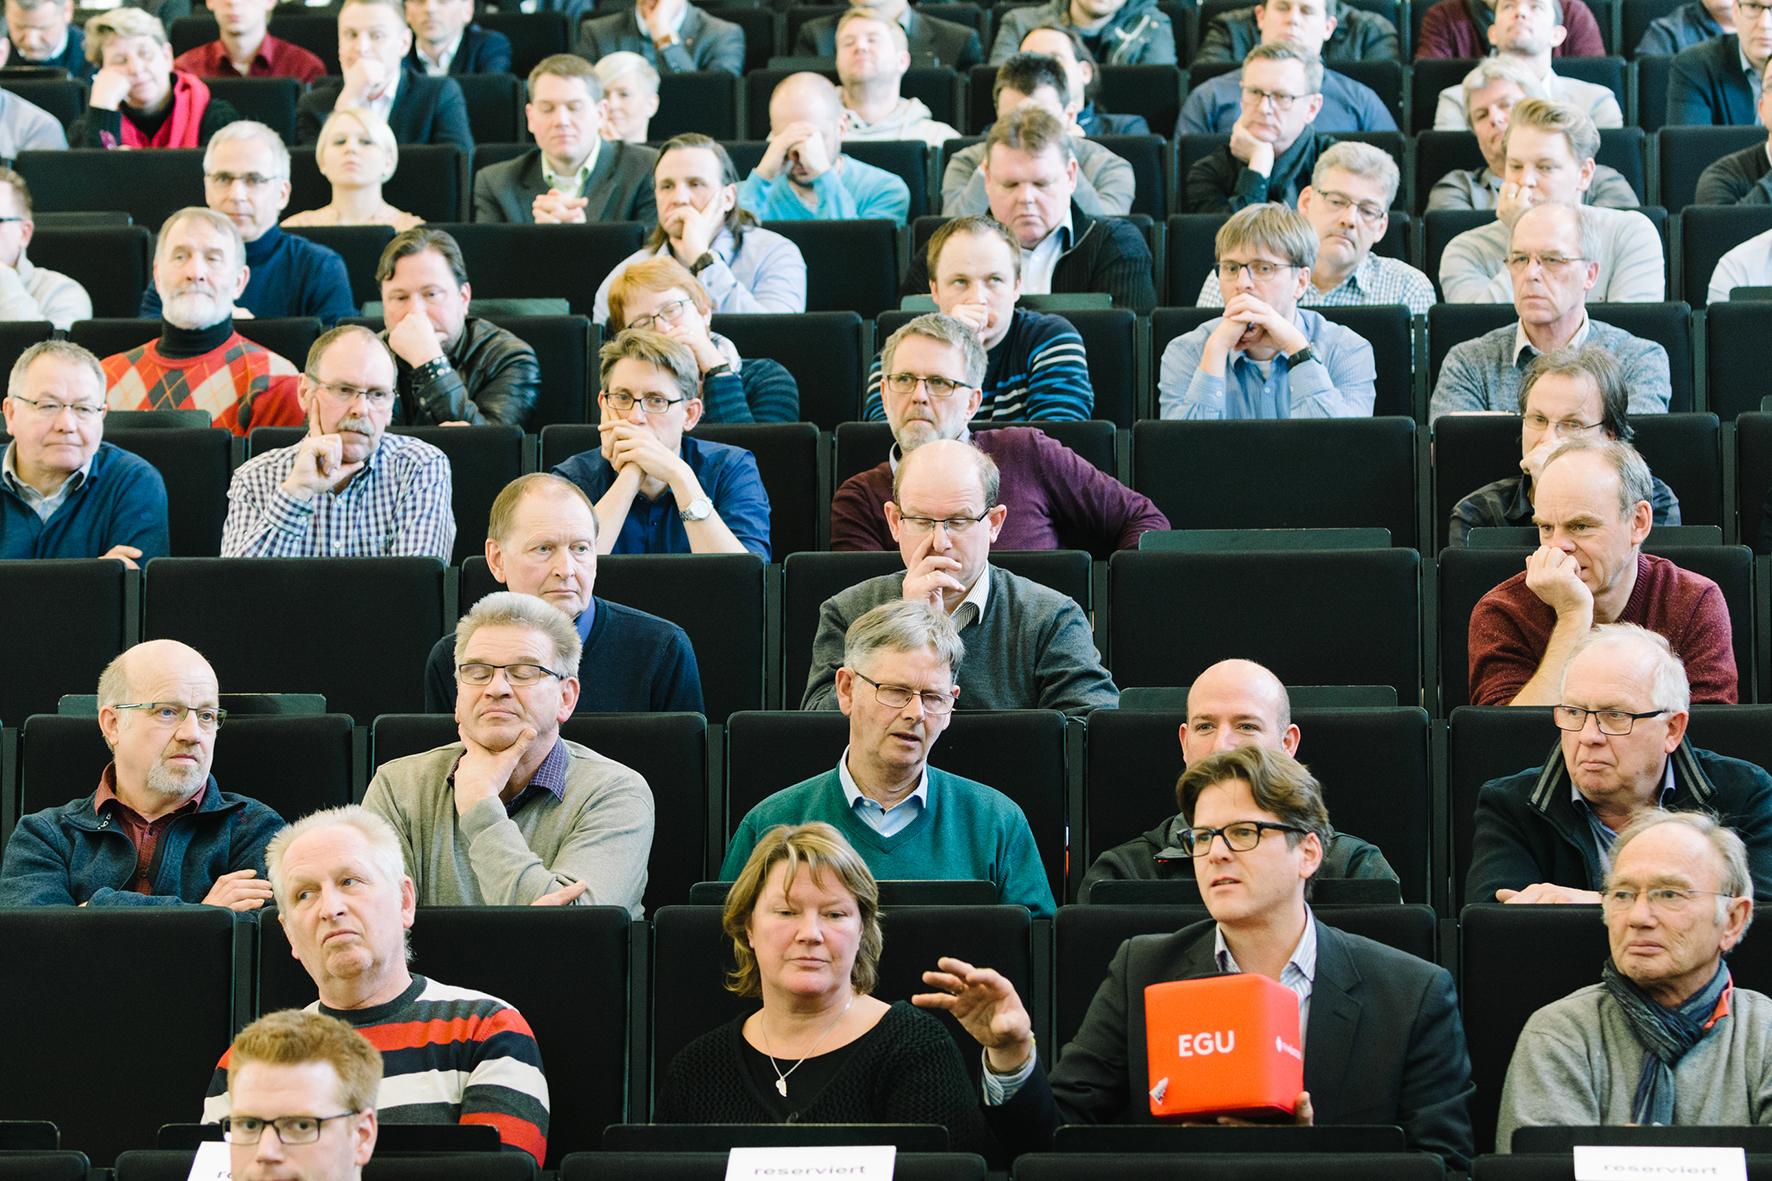 Publikum mit orangenem Mikrofon-Würfel